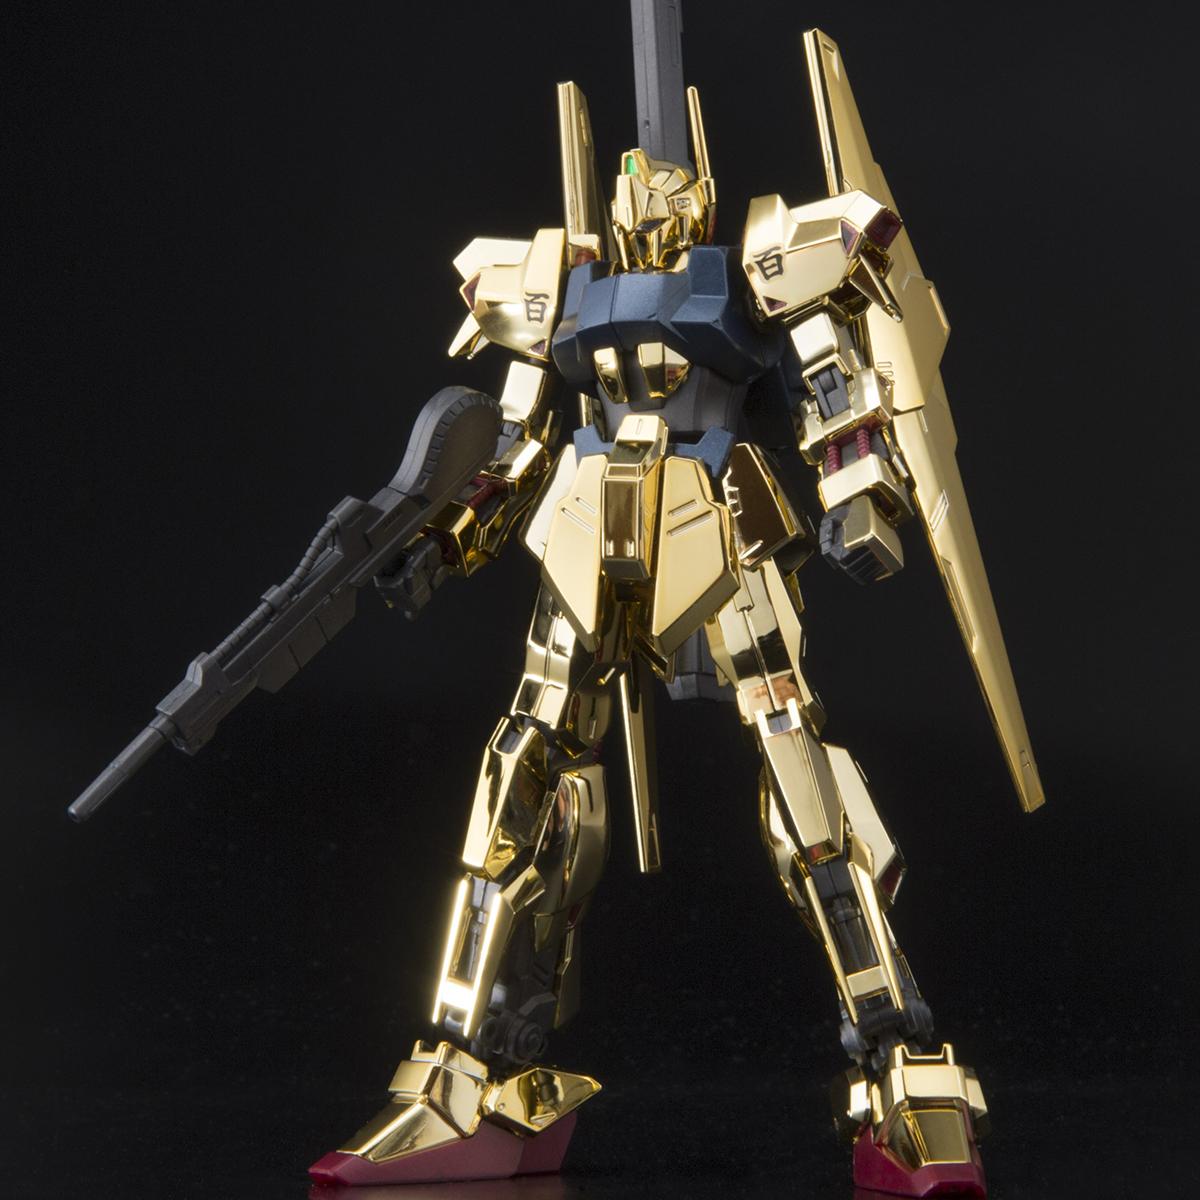 HG 1/144 THE GUNDAM BASE LIMITED HYAKU-SHIKI [GOLD COATING][Sep 2020 Delivery]